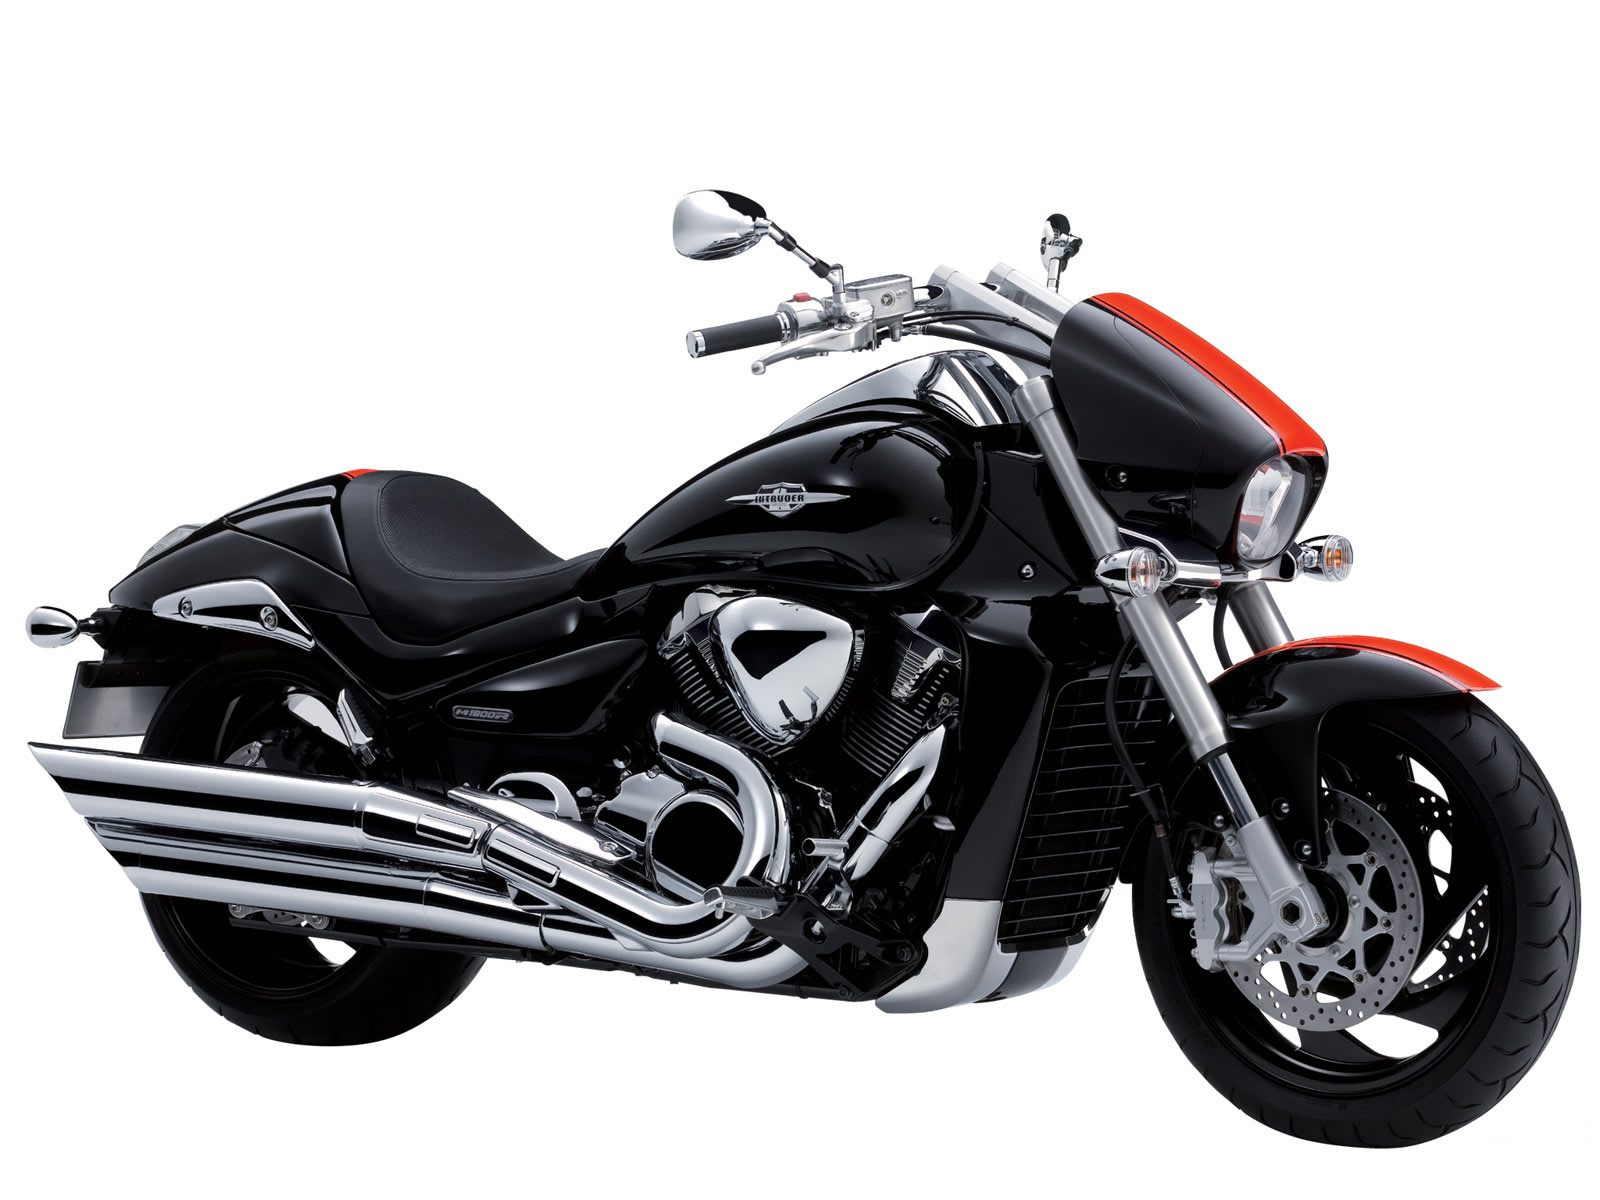 2011 suzuki vzr 1800 motorcycle photos. Black Bedroom Furniture Sets. Home Design Ideas